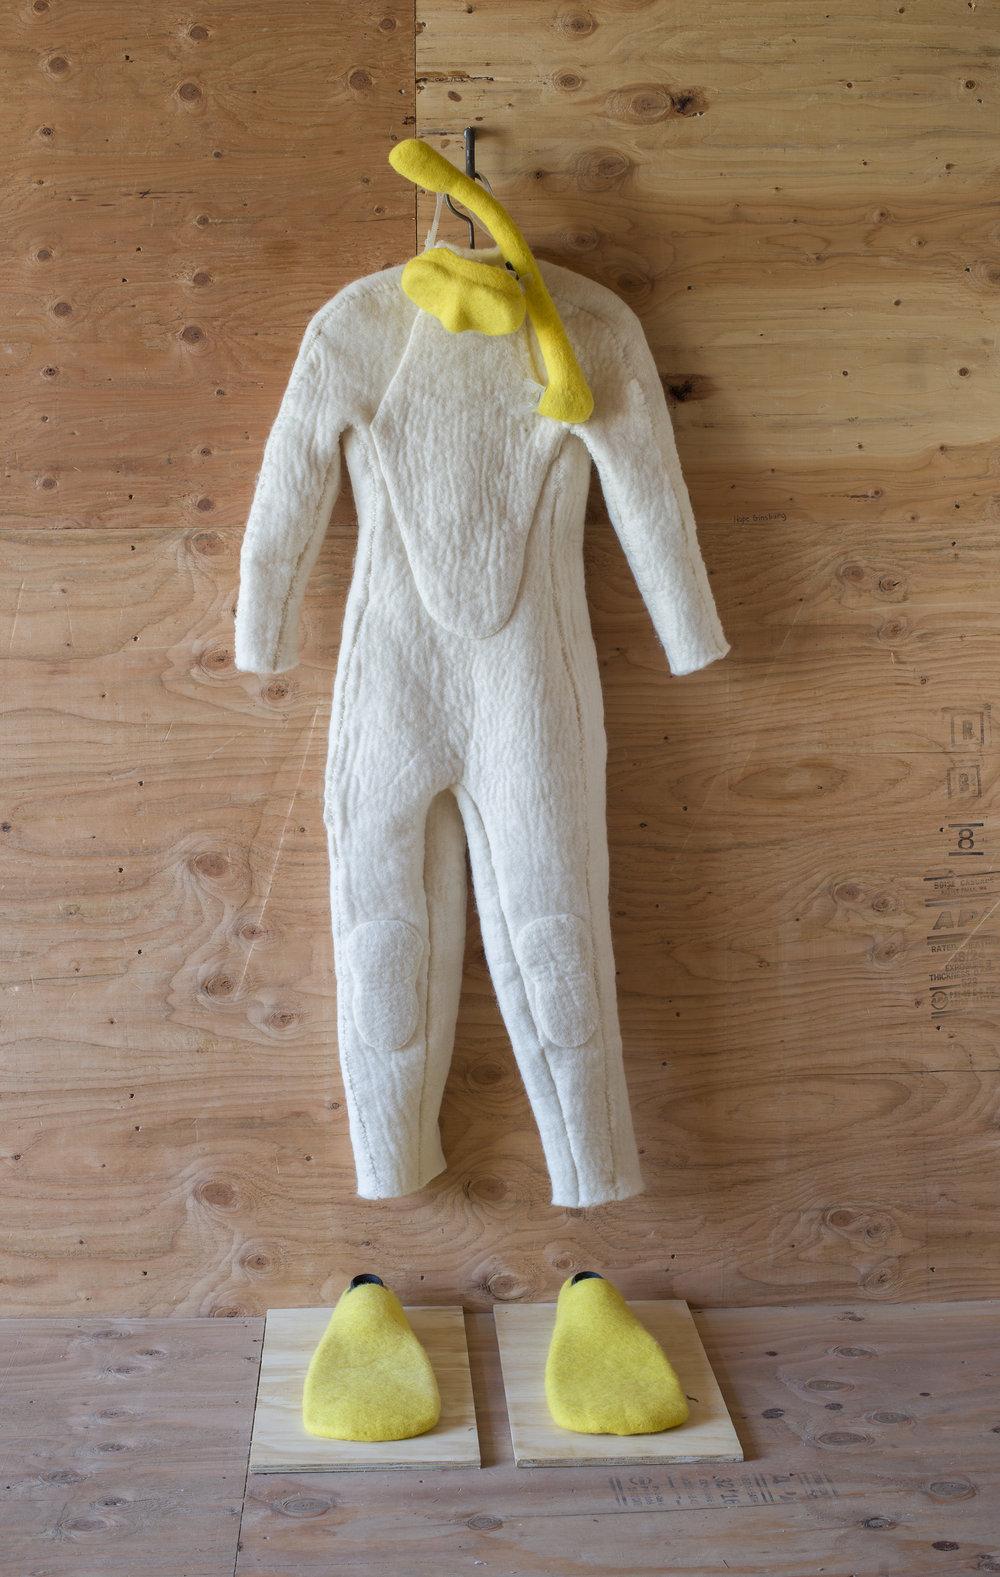 HG-Felt Suit-1 2500.jpg